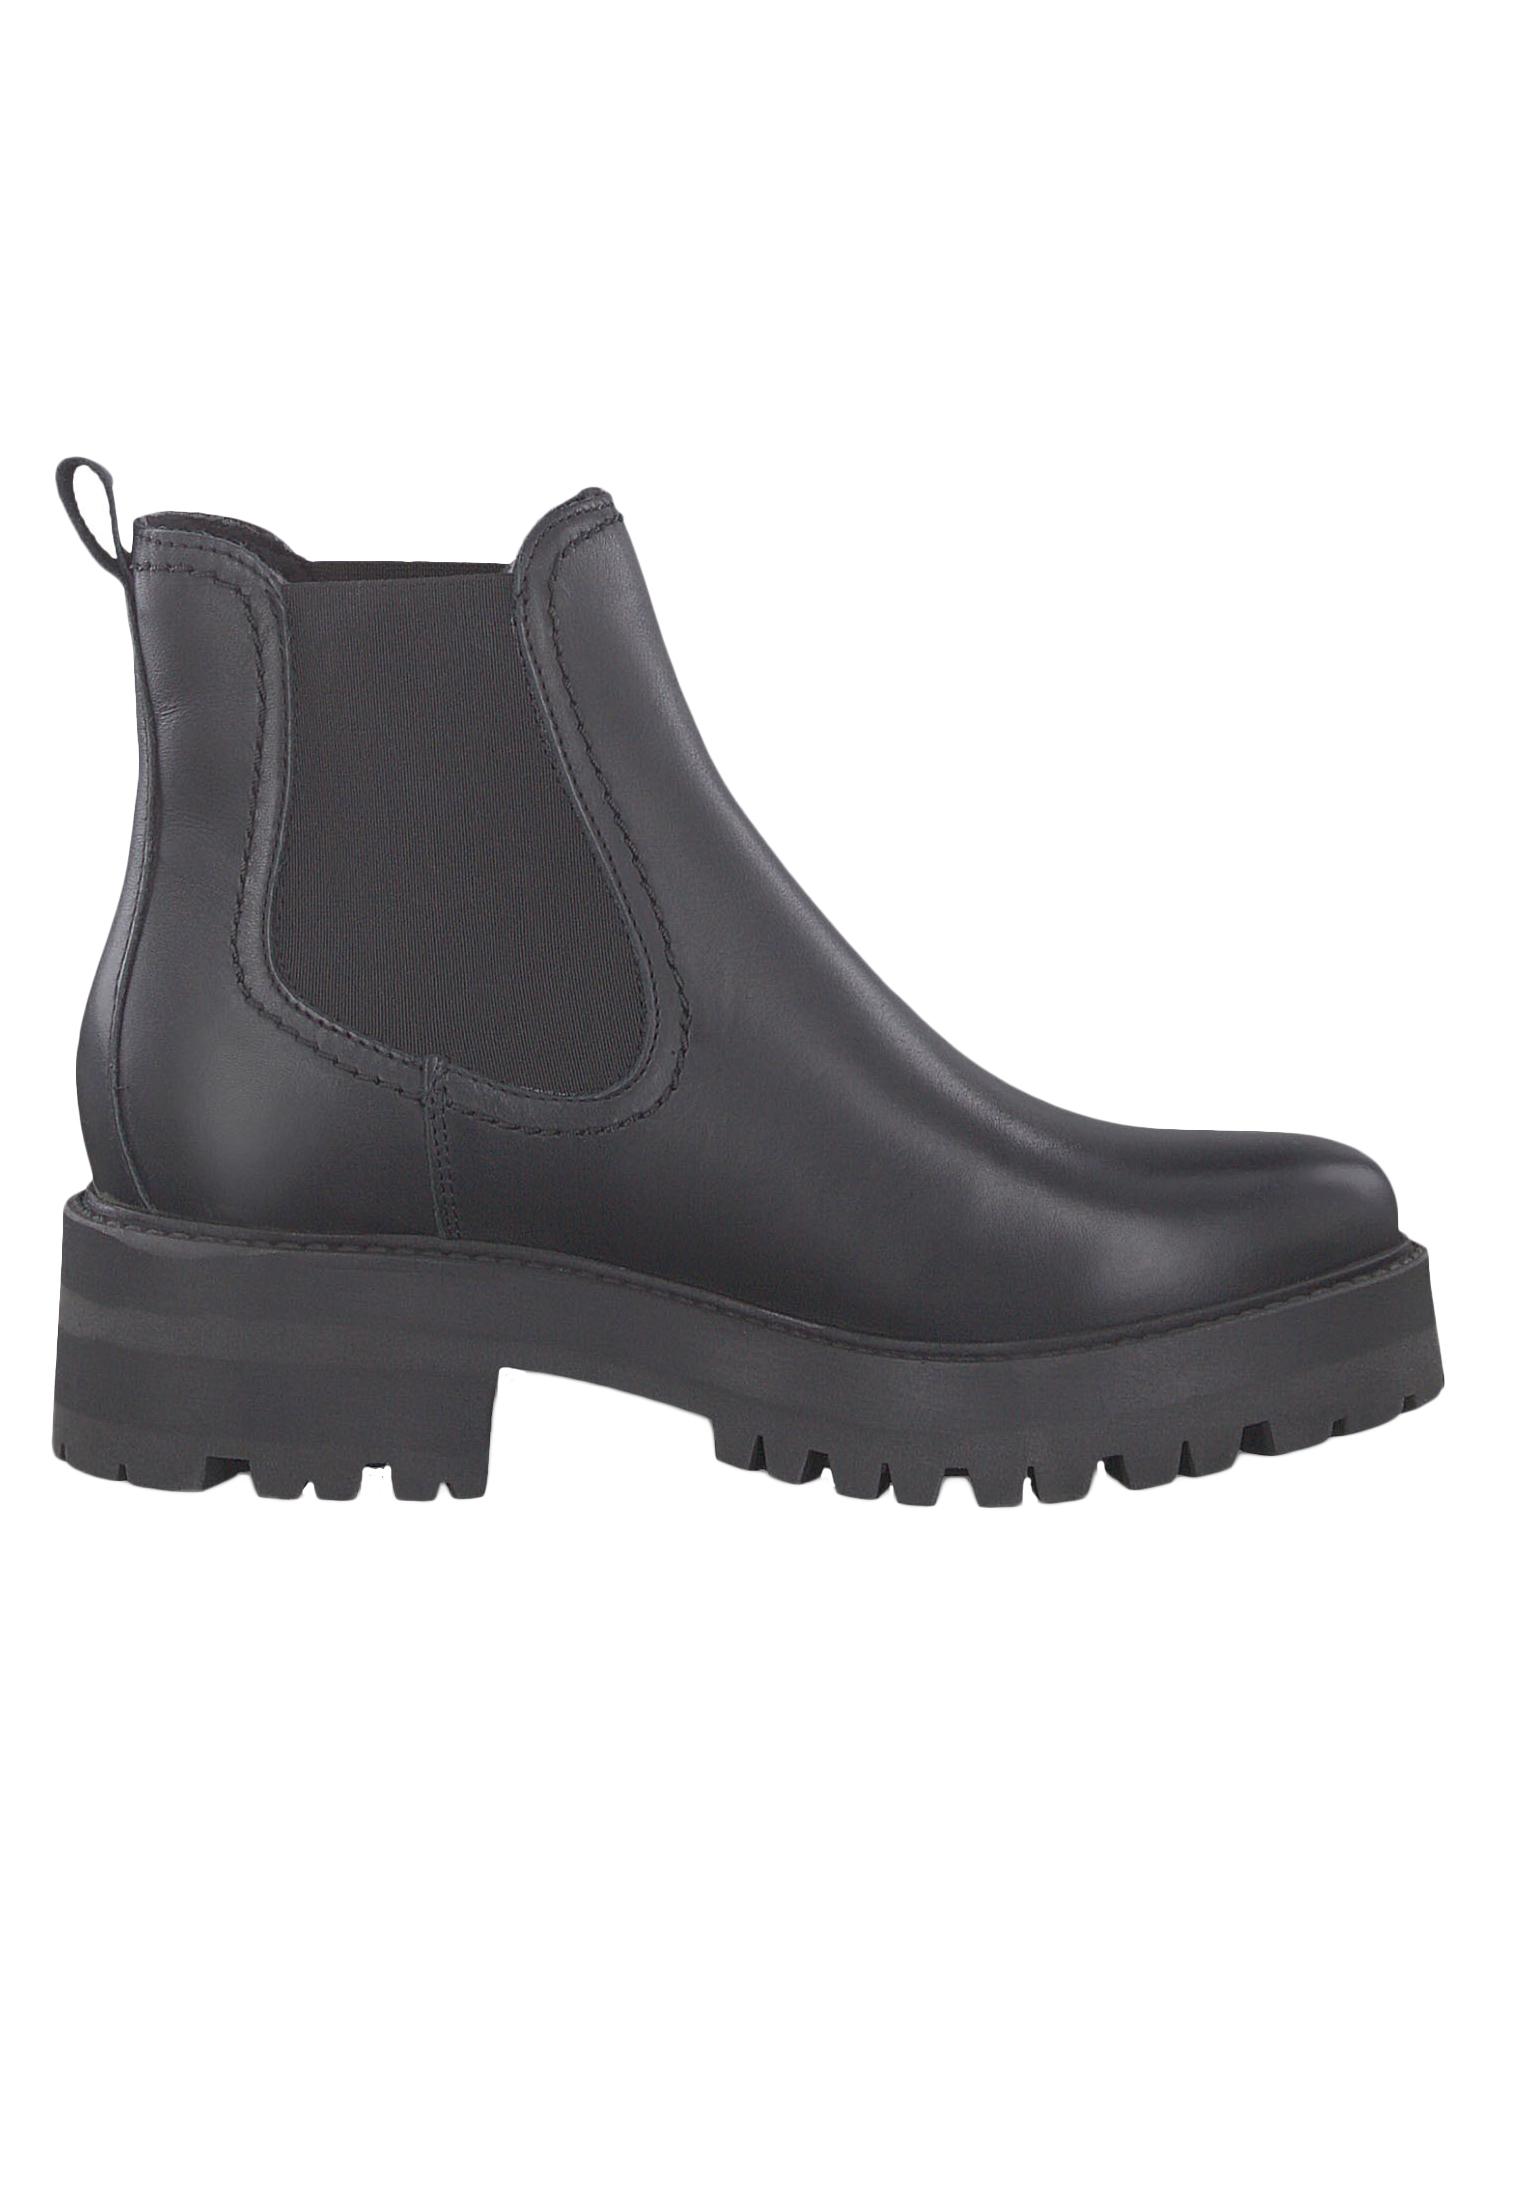 Tamaris 1 25445 23 003 Damen Stiefelette Chelsea Boot Leder Black Leather Schwarz